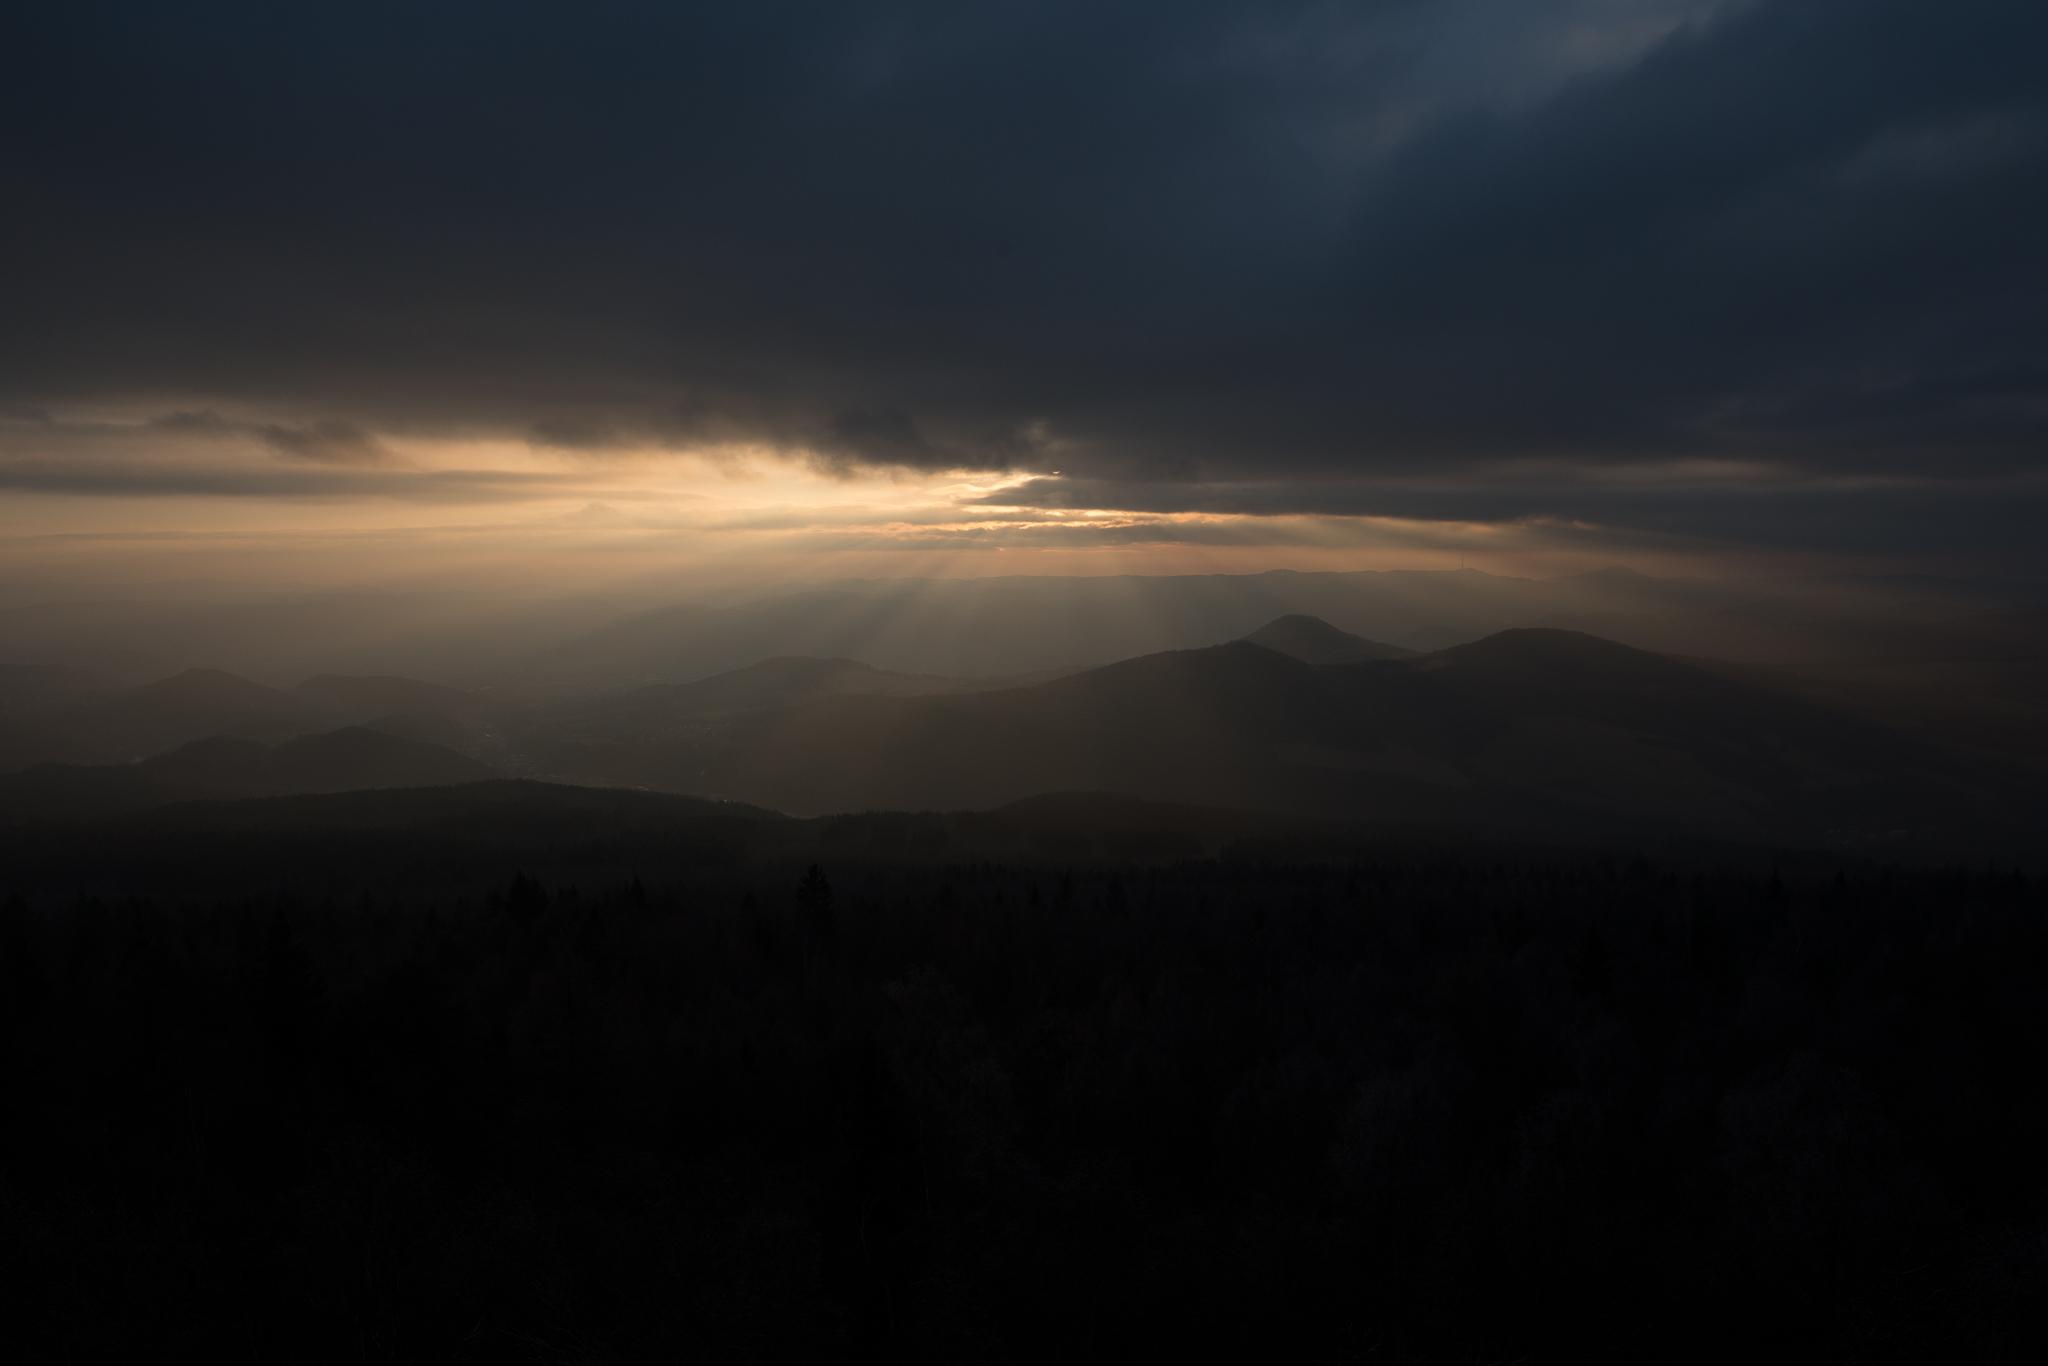 Sunset 02 - 01